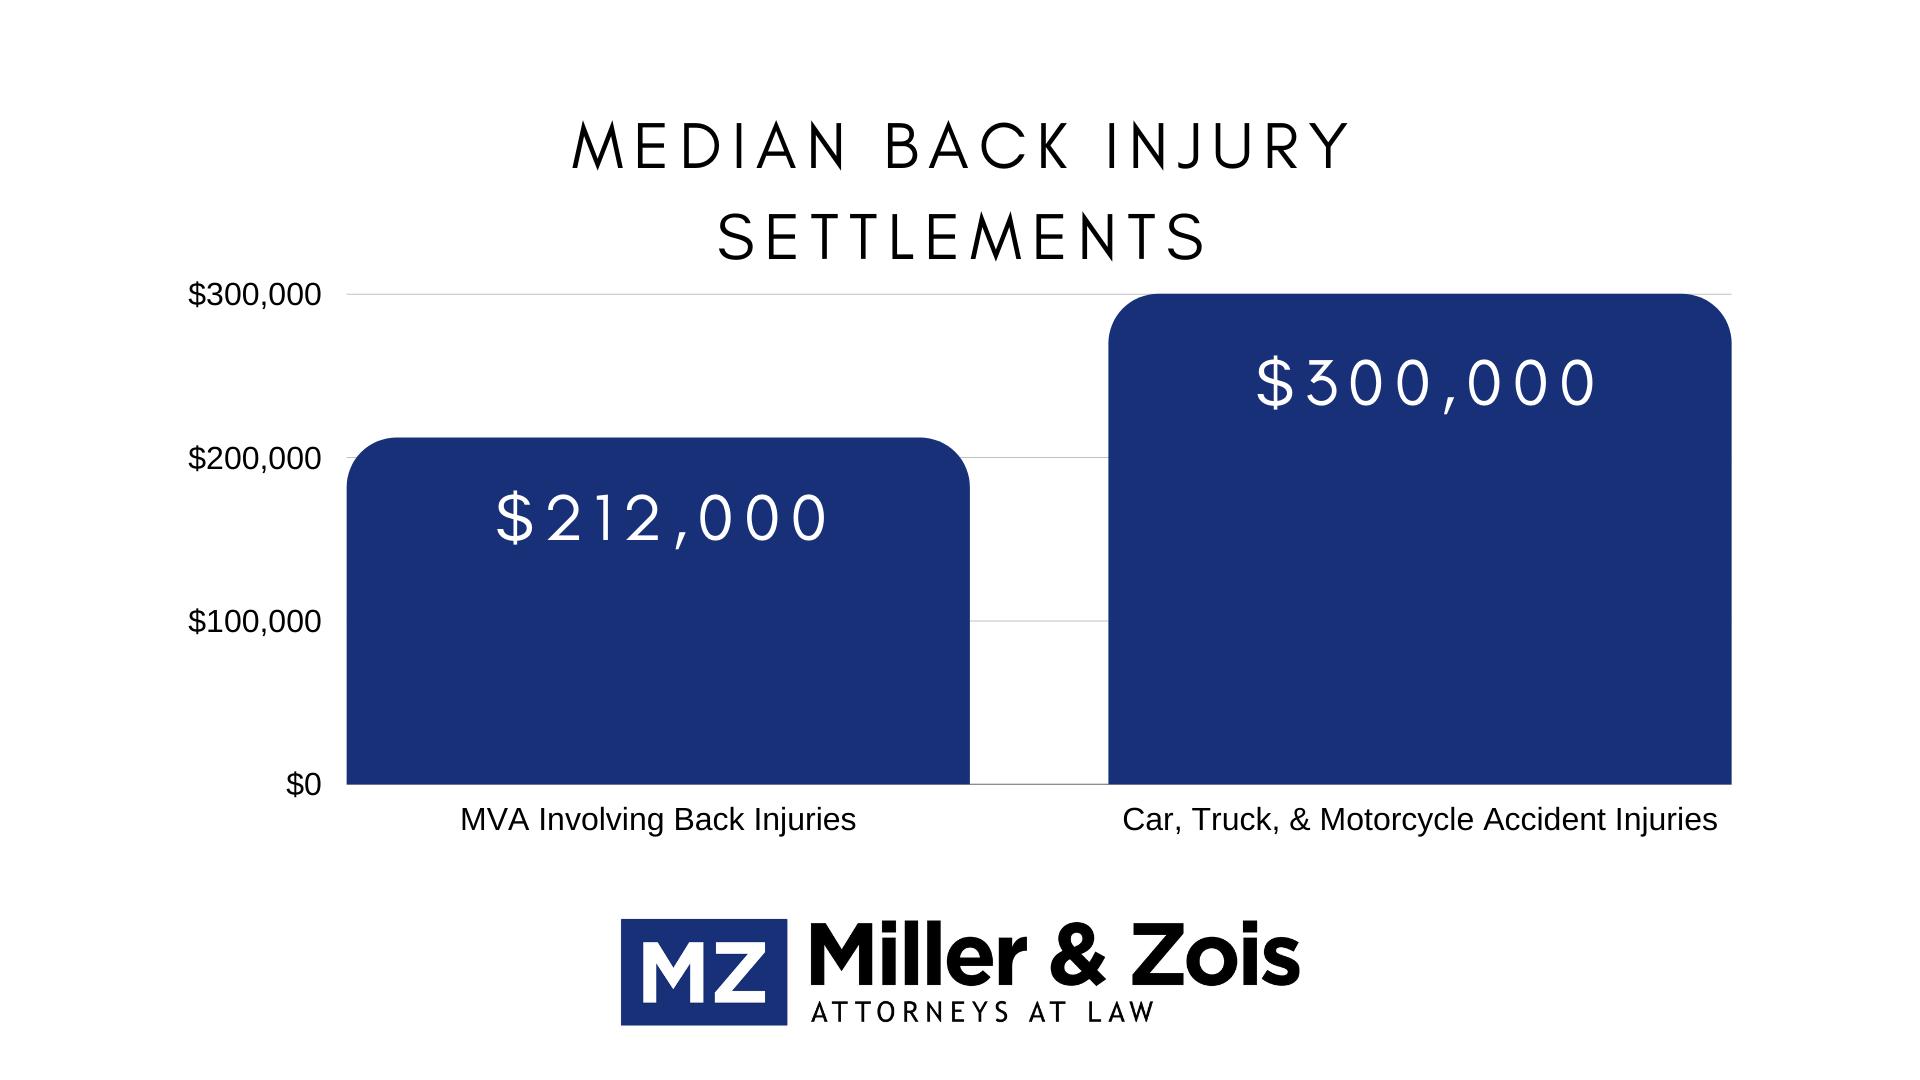 median back injury settlements